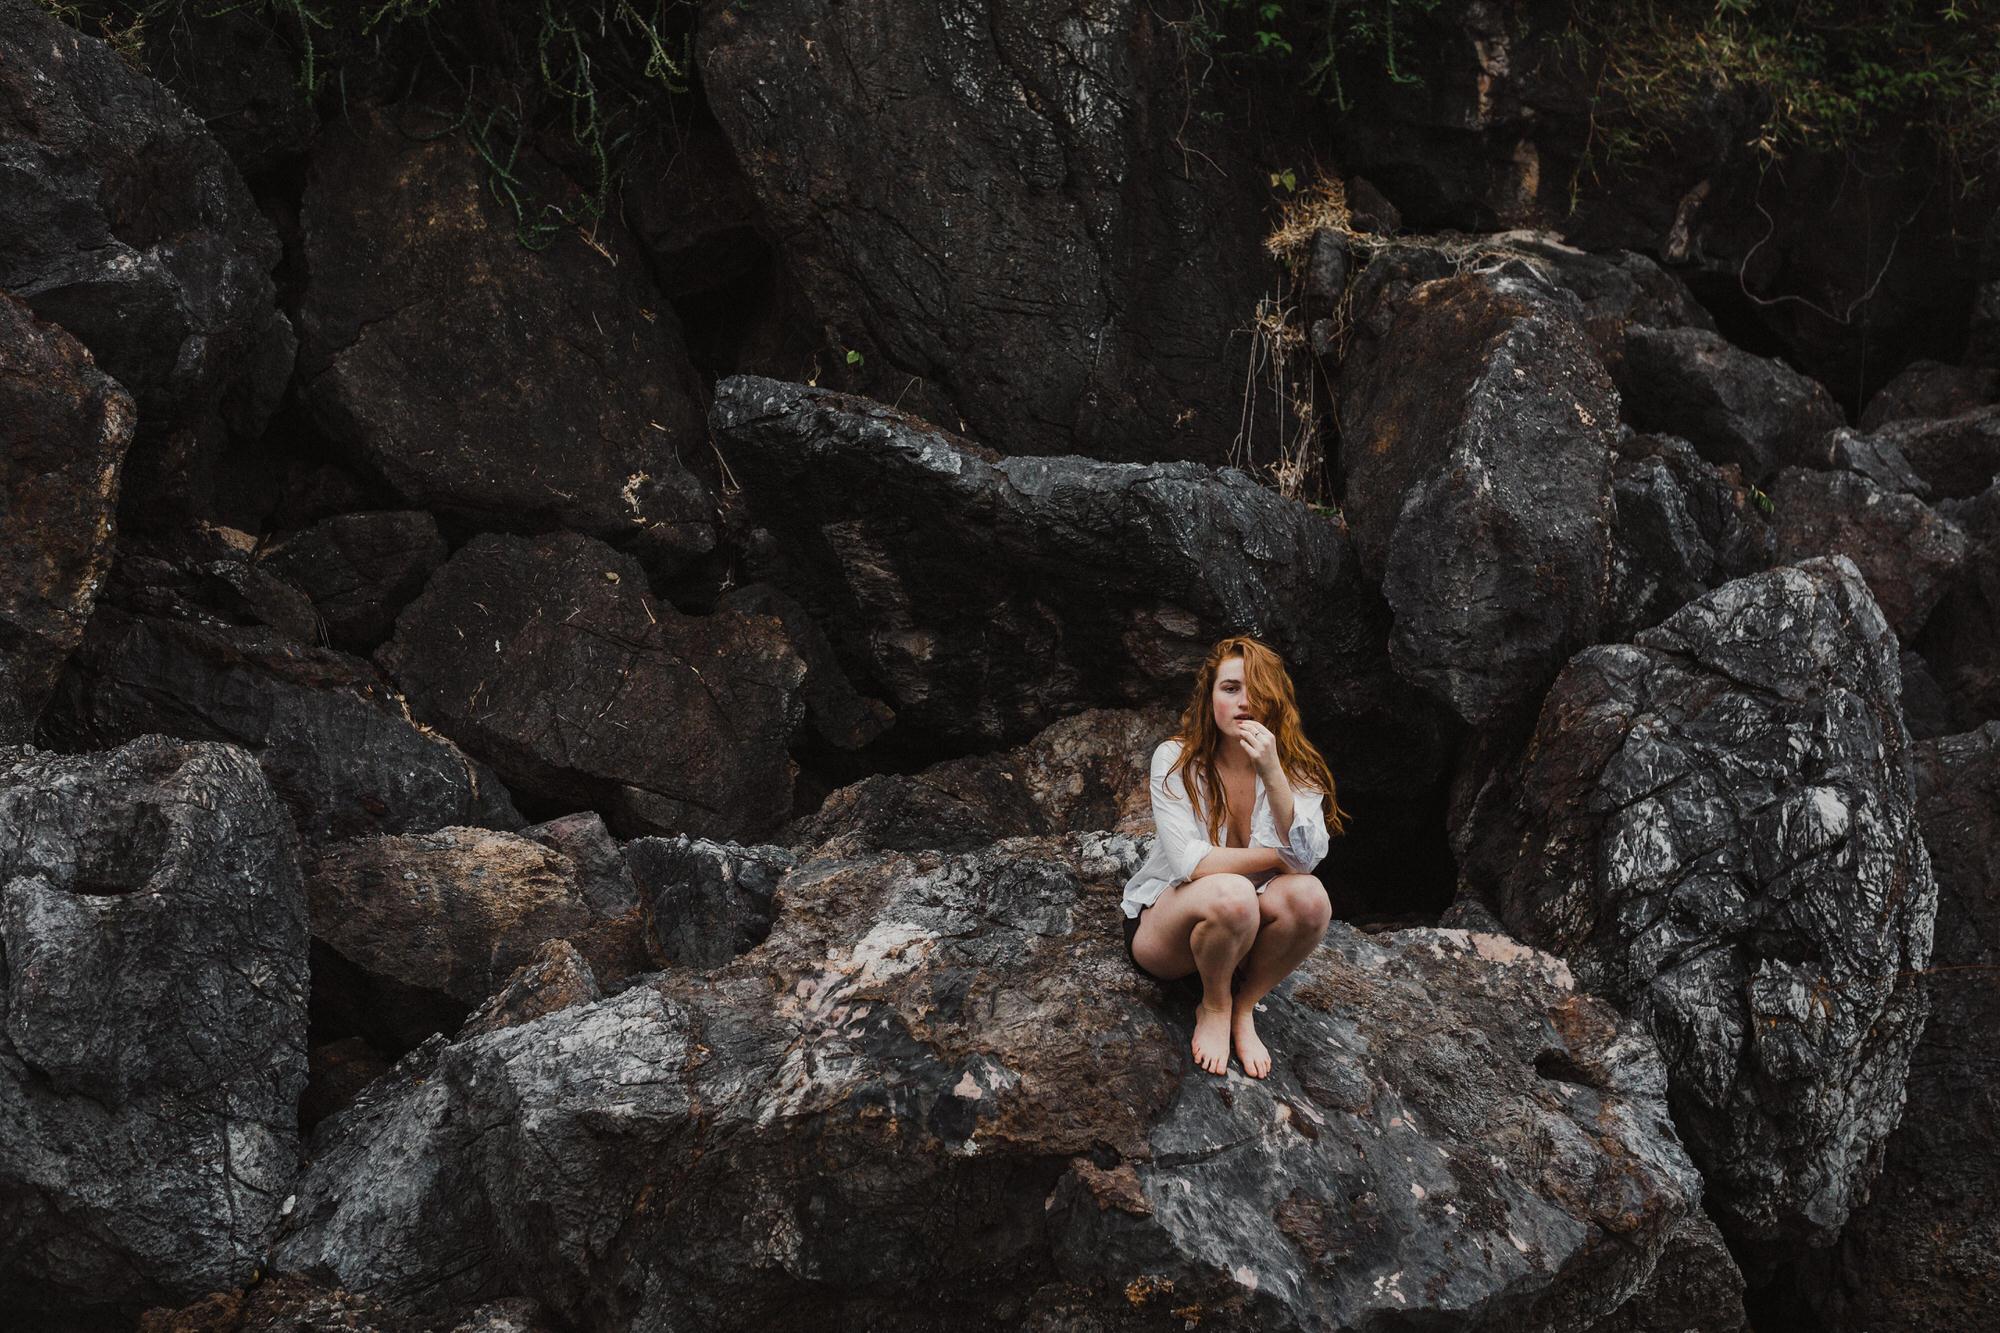 halongbayselfportraitblackrocks.jpg